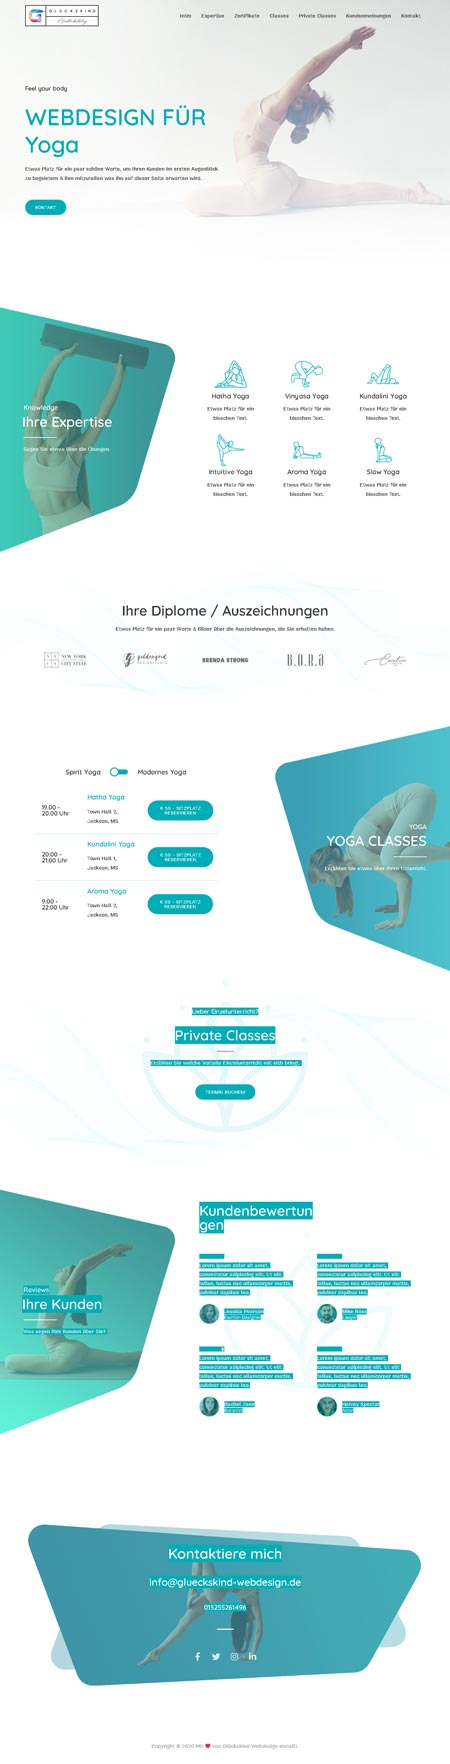 Yoga Iyengar - Glückskind Webdesign Musterkatalog